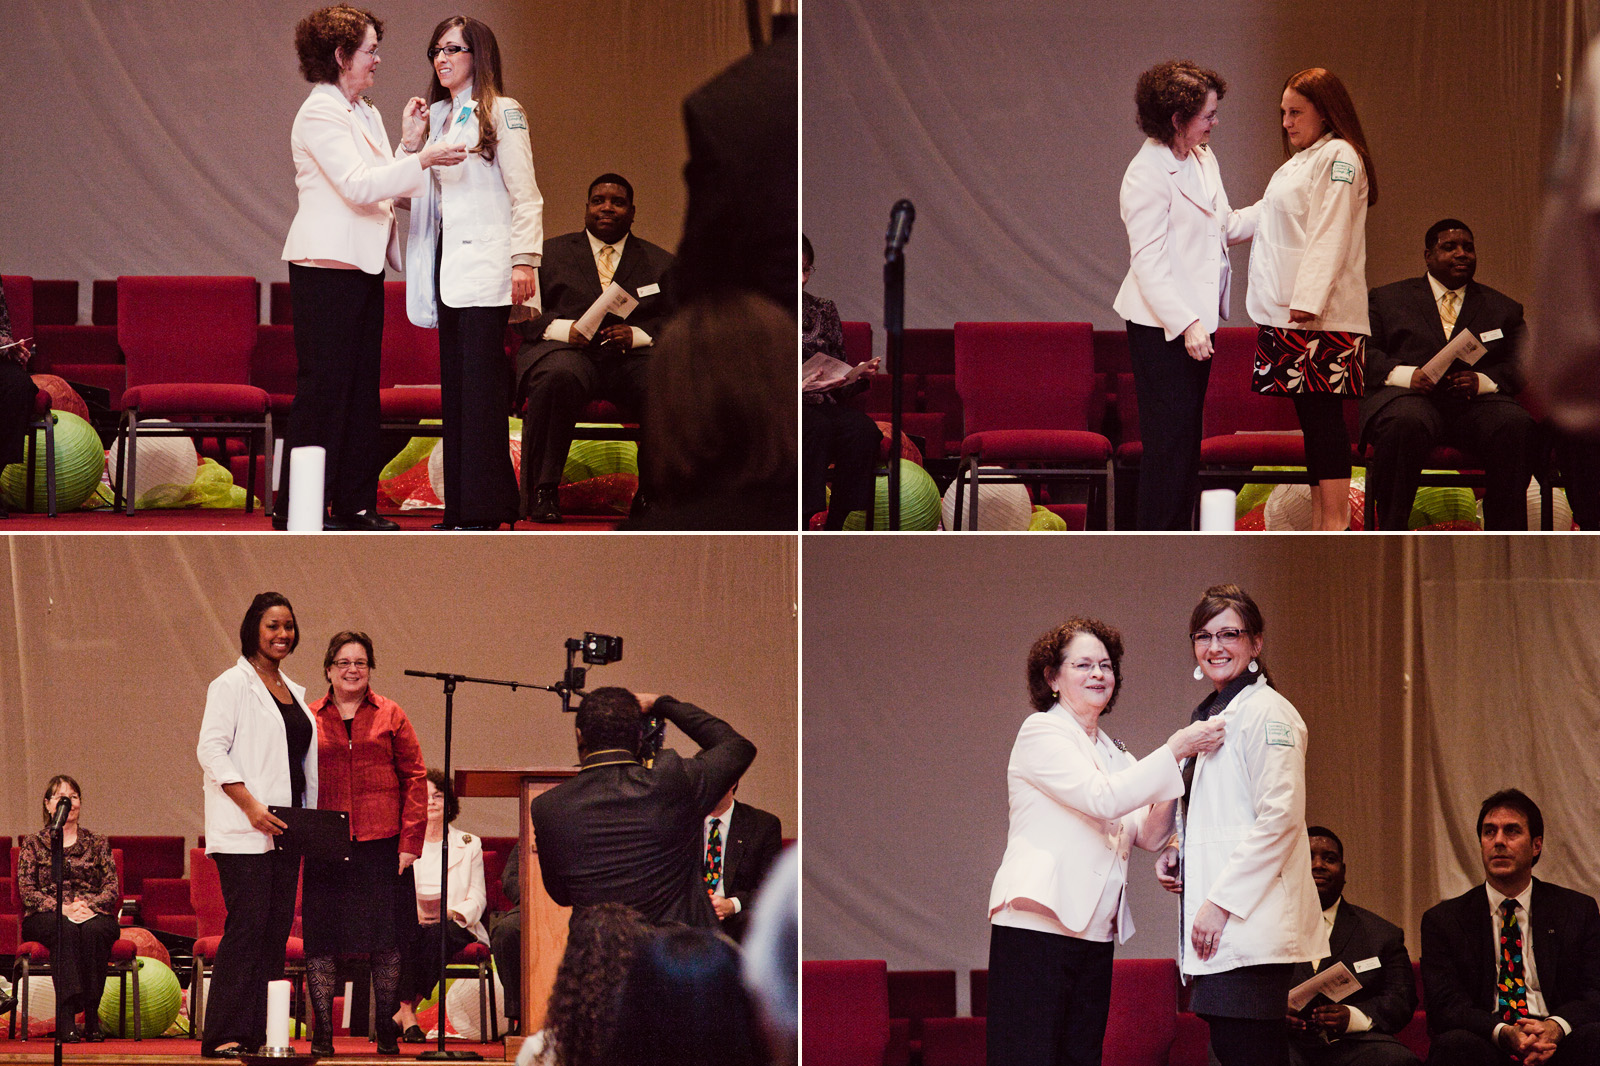 Angela-Graduation-Wknd-12.jpg